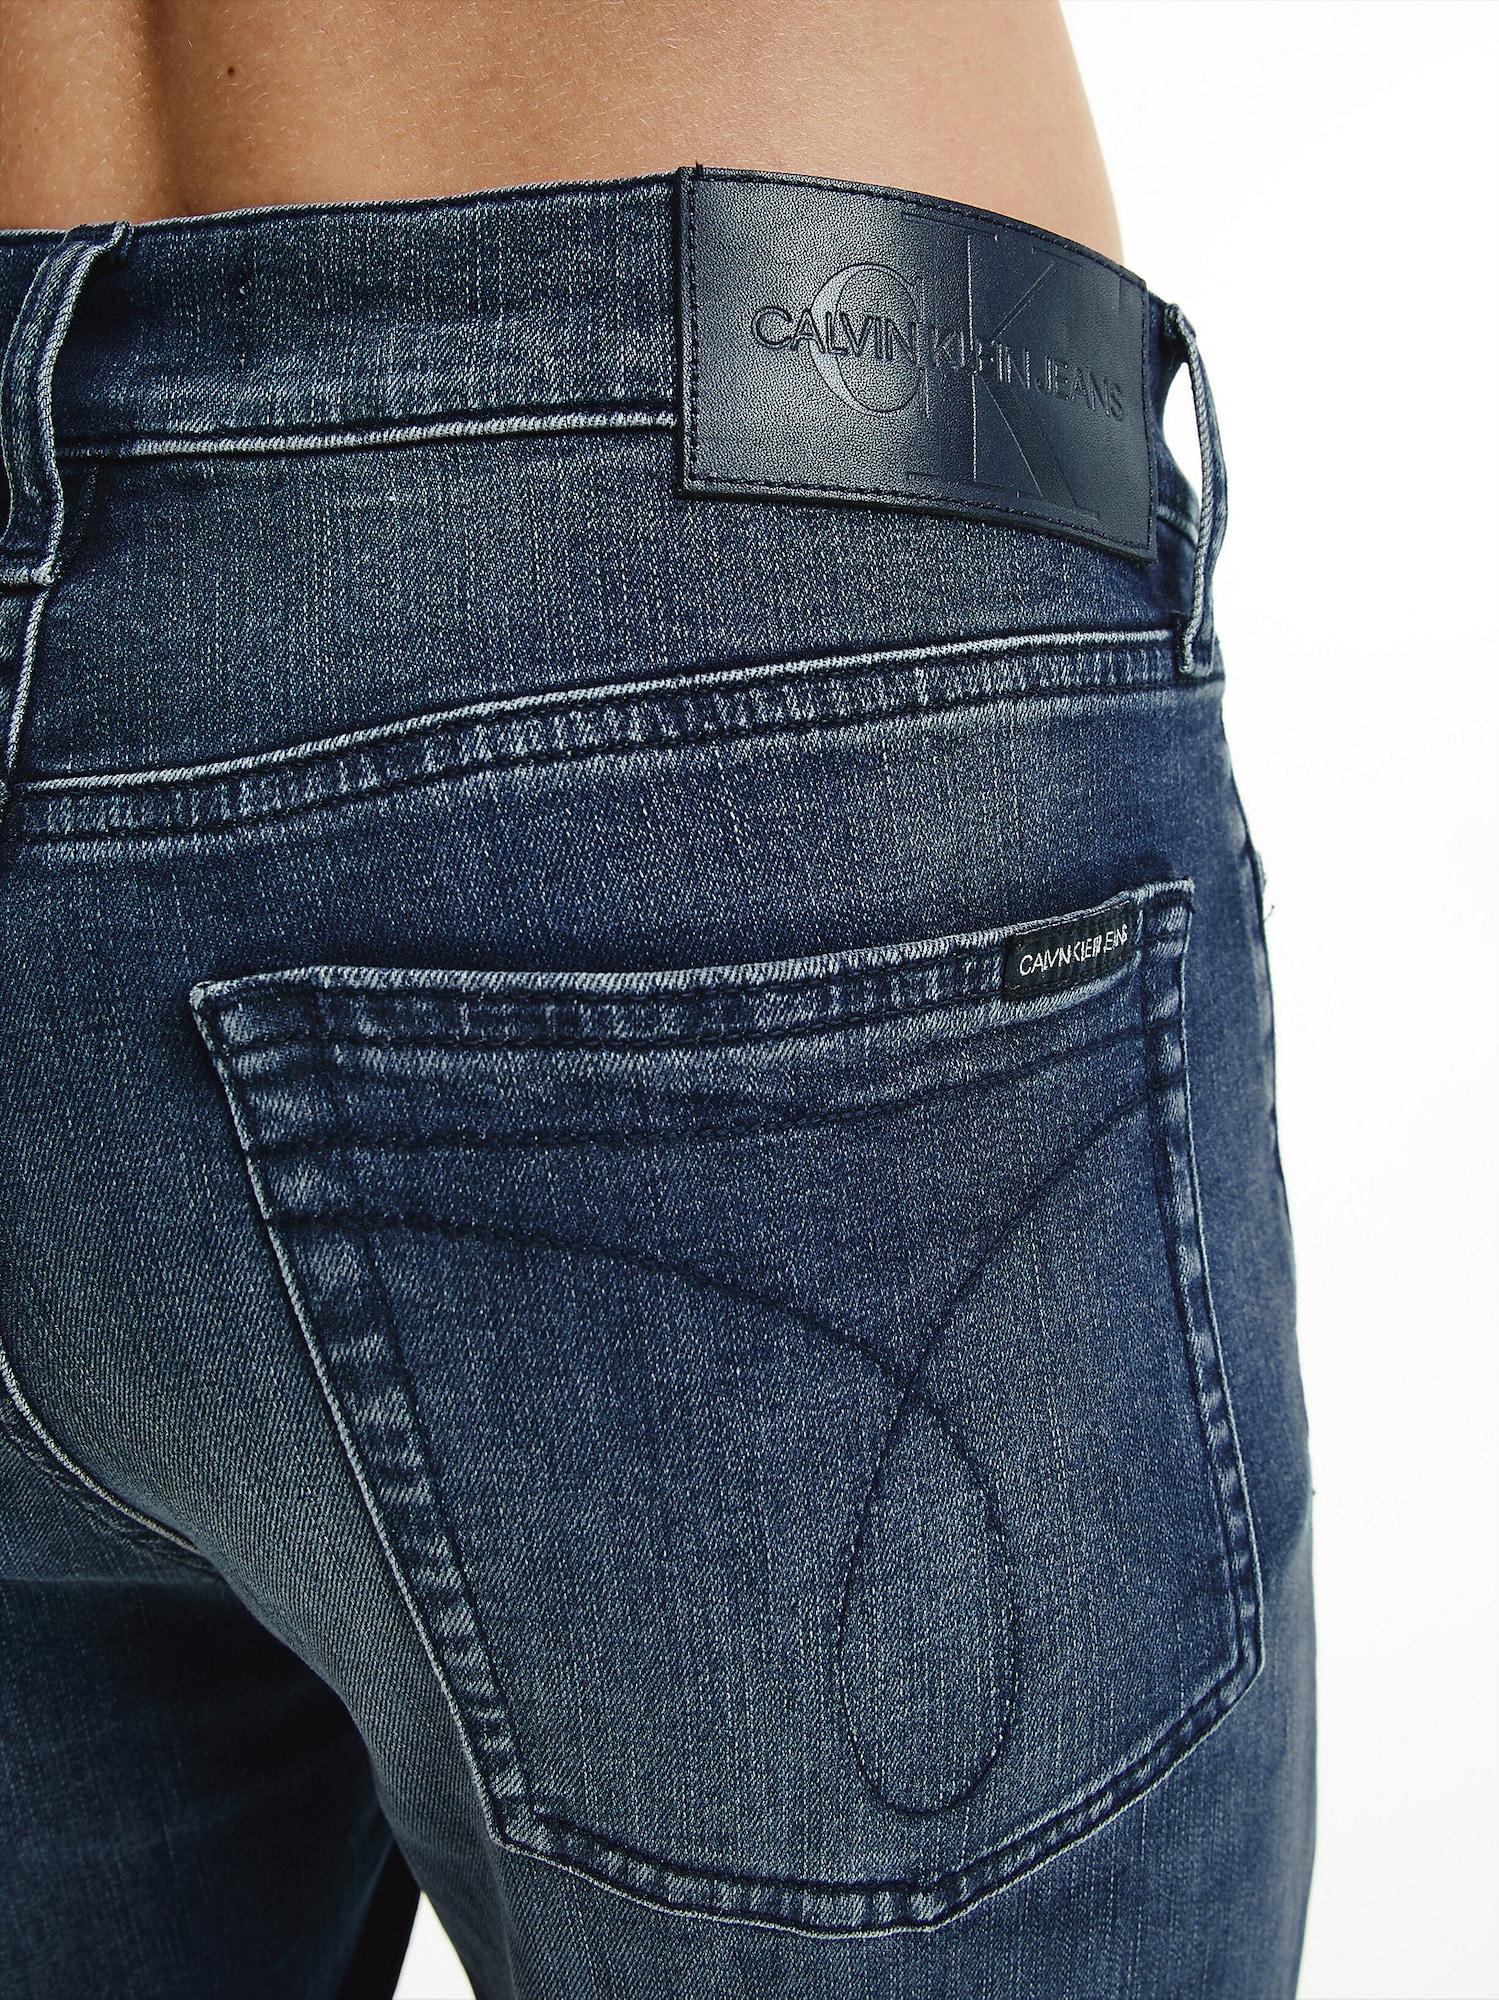 Calvin Klein Jeans Džínsy  modrá denim.